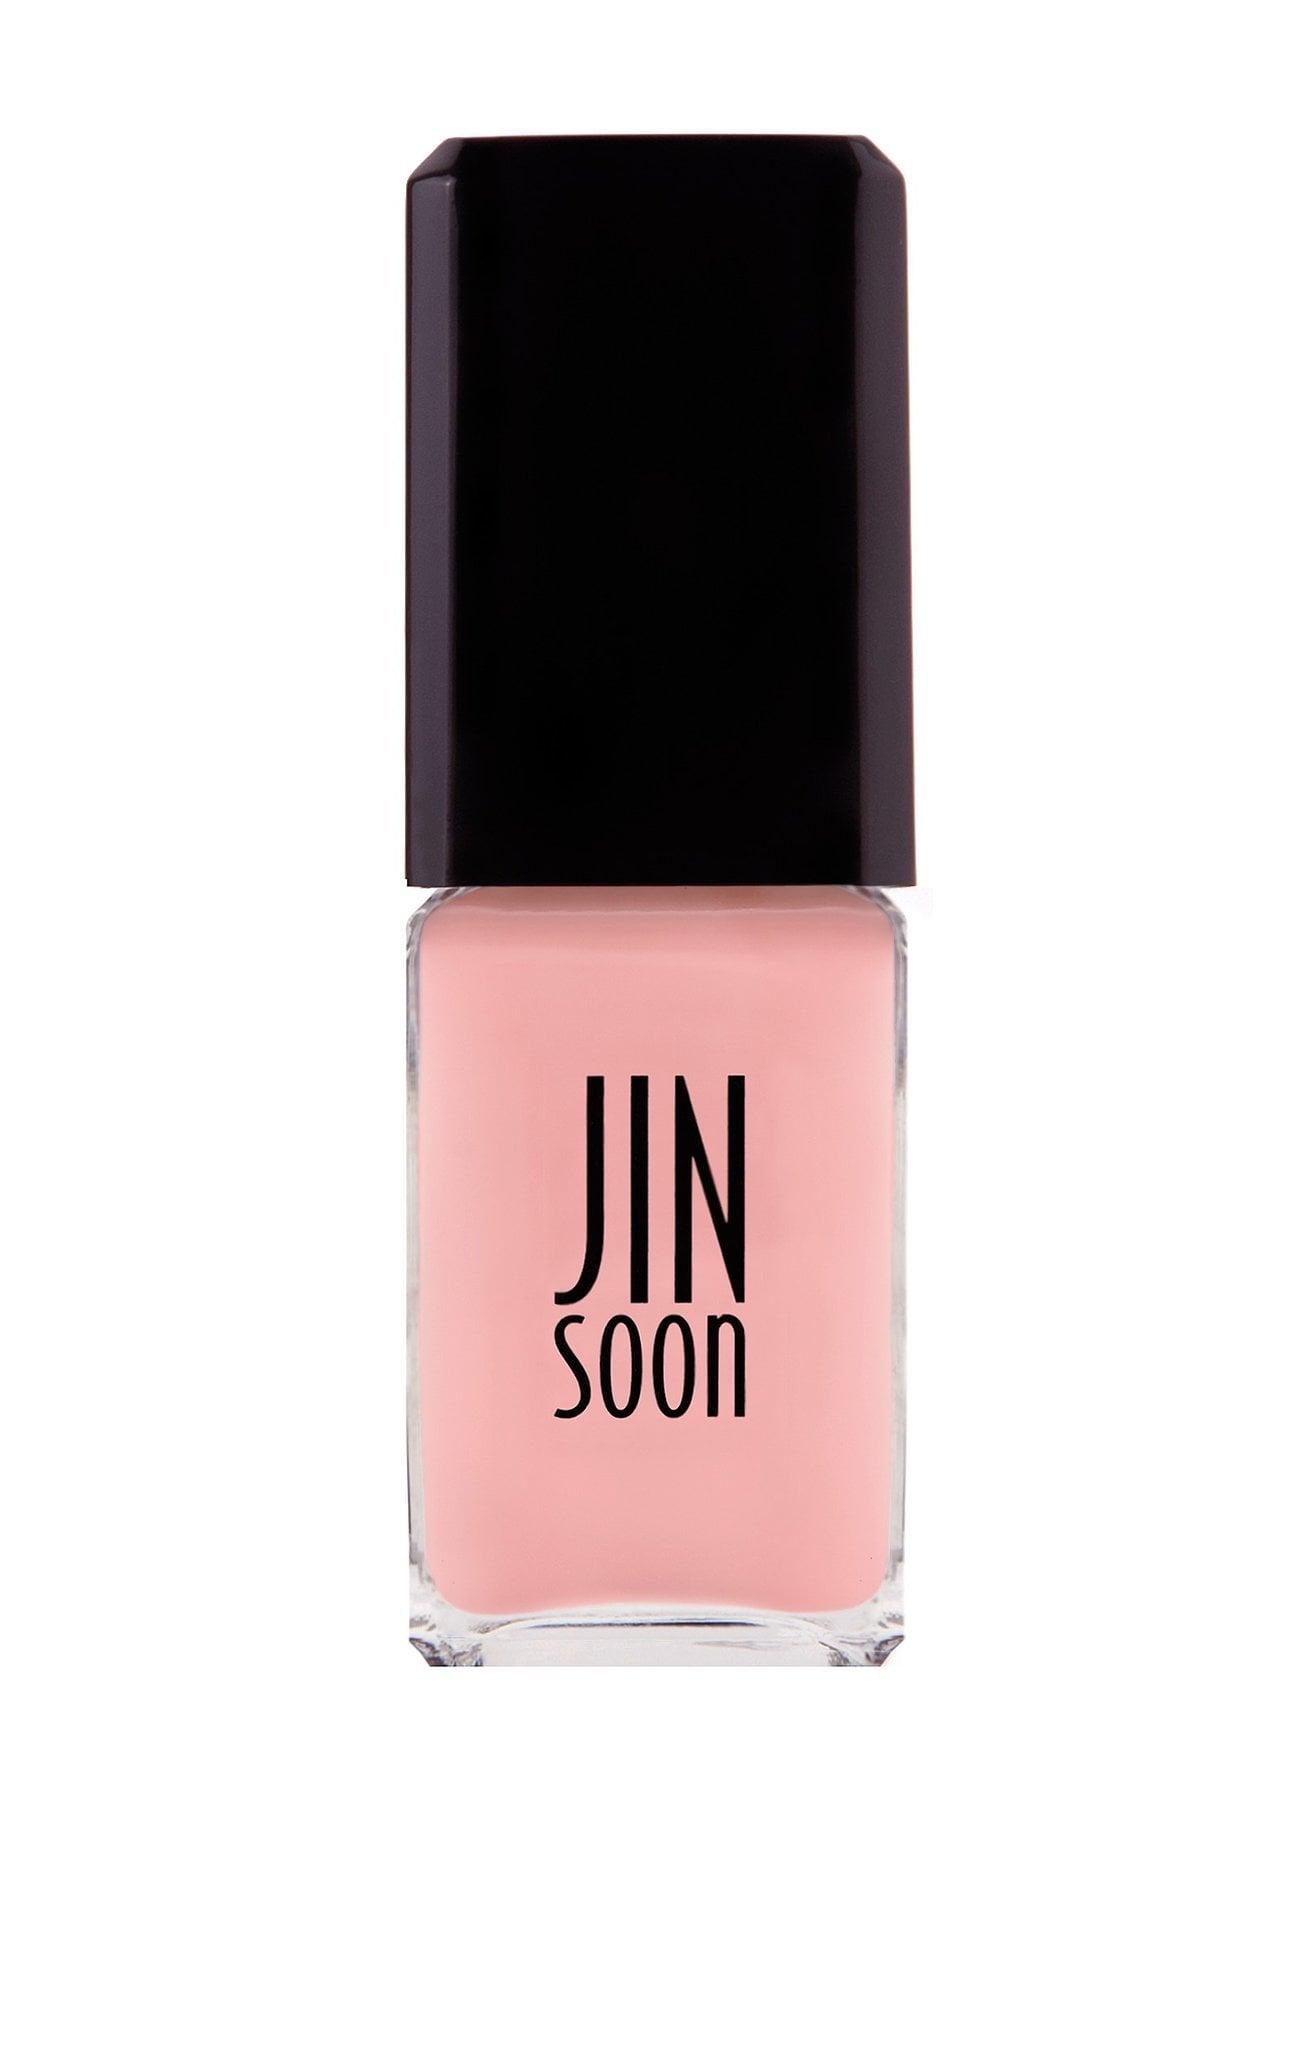 Jin Soon Dolly Pink ($18)